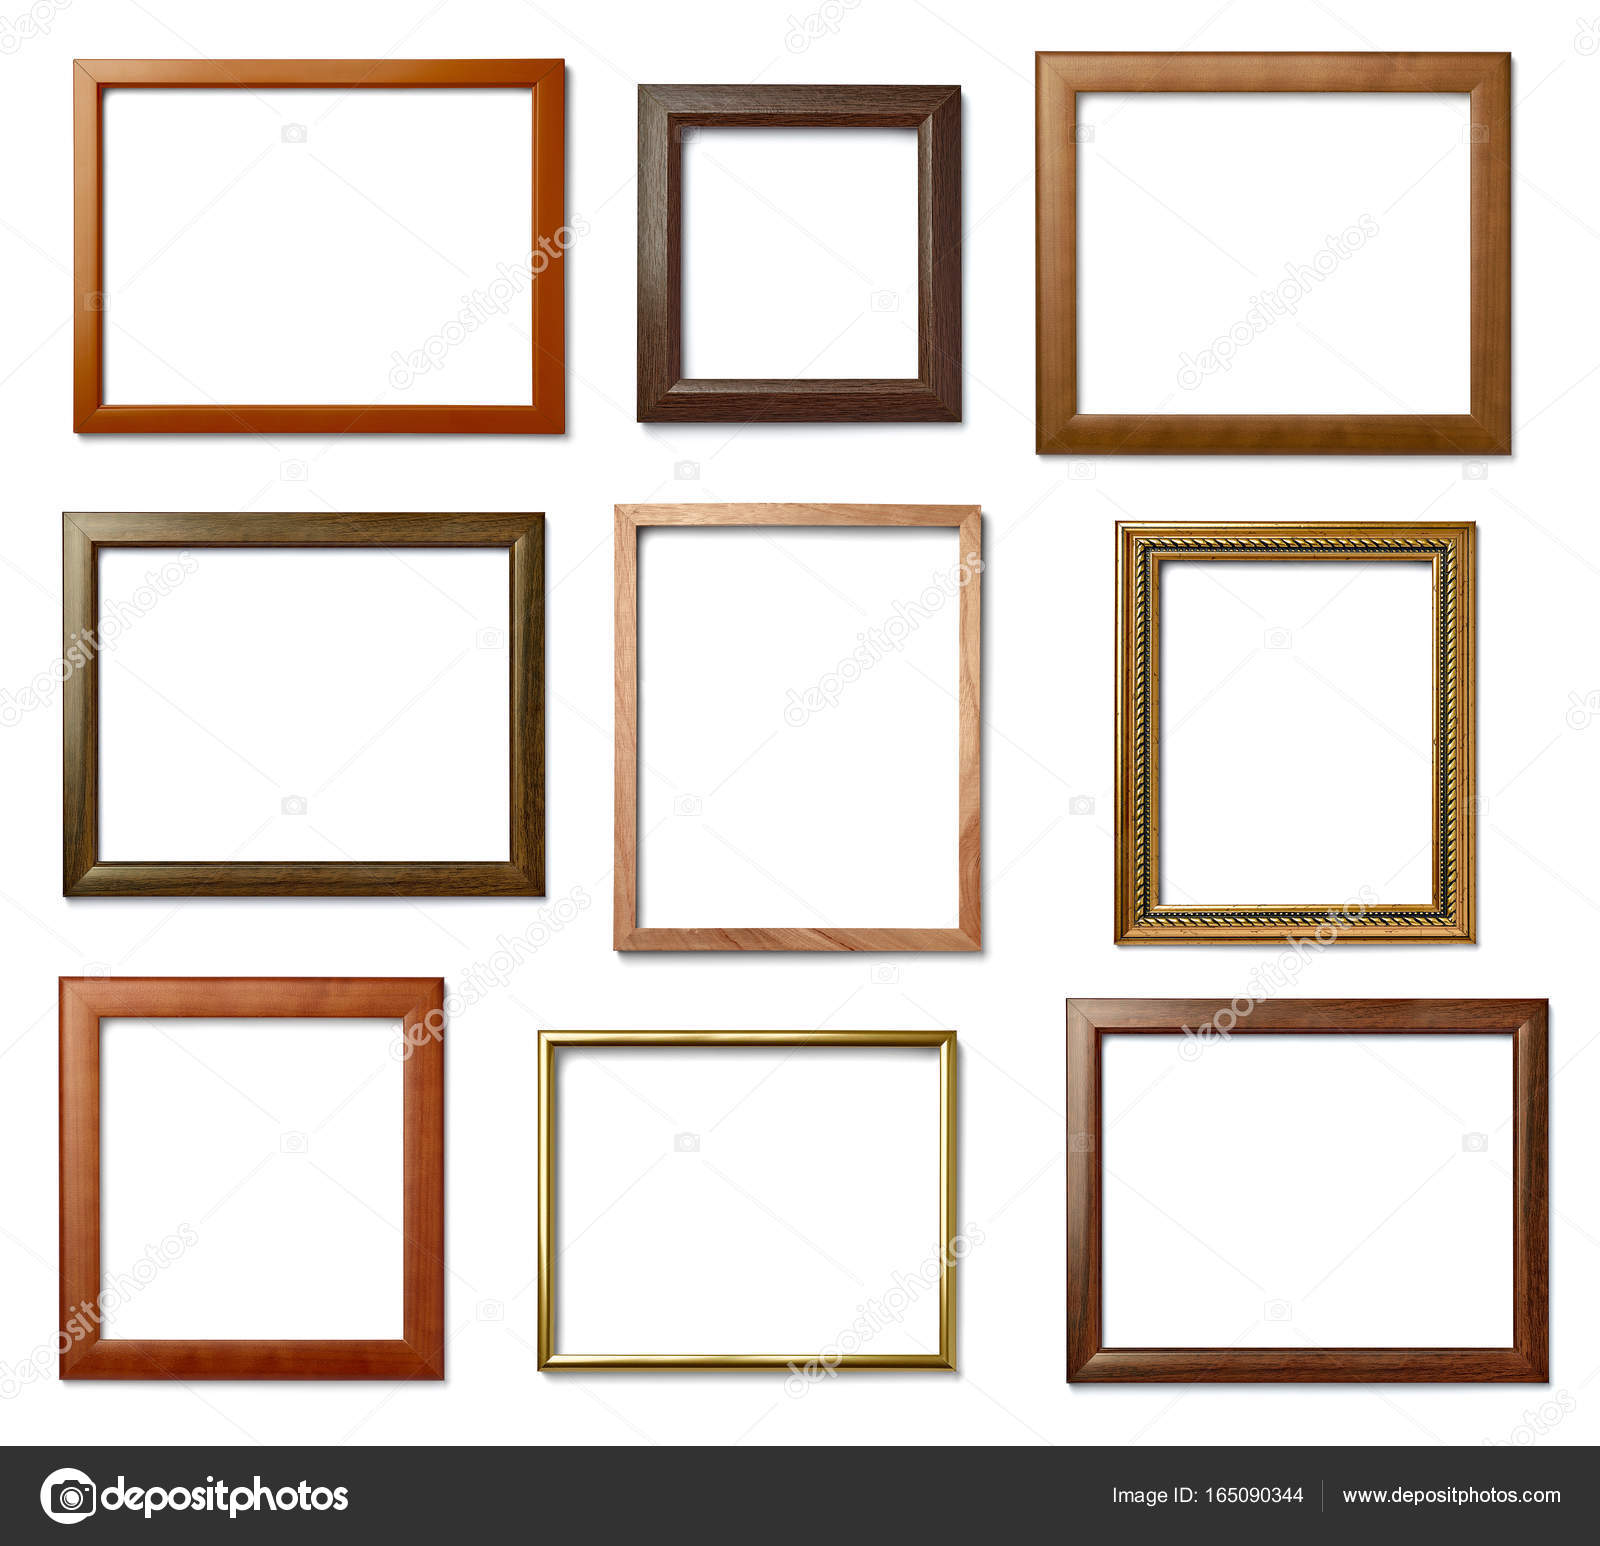 Vintage-Rahmen Holz Hintergrundbild — Stockfoto © PicsFive #165090344